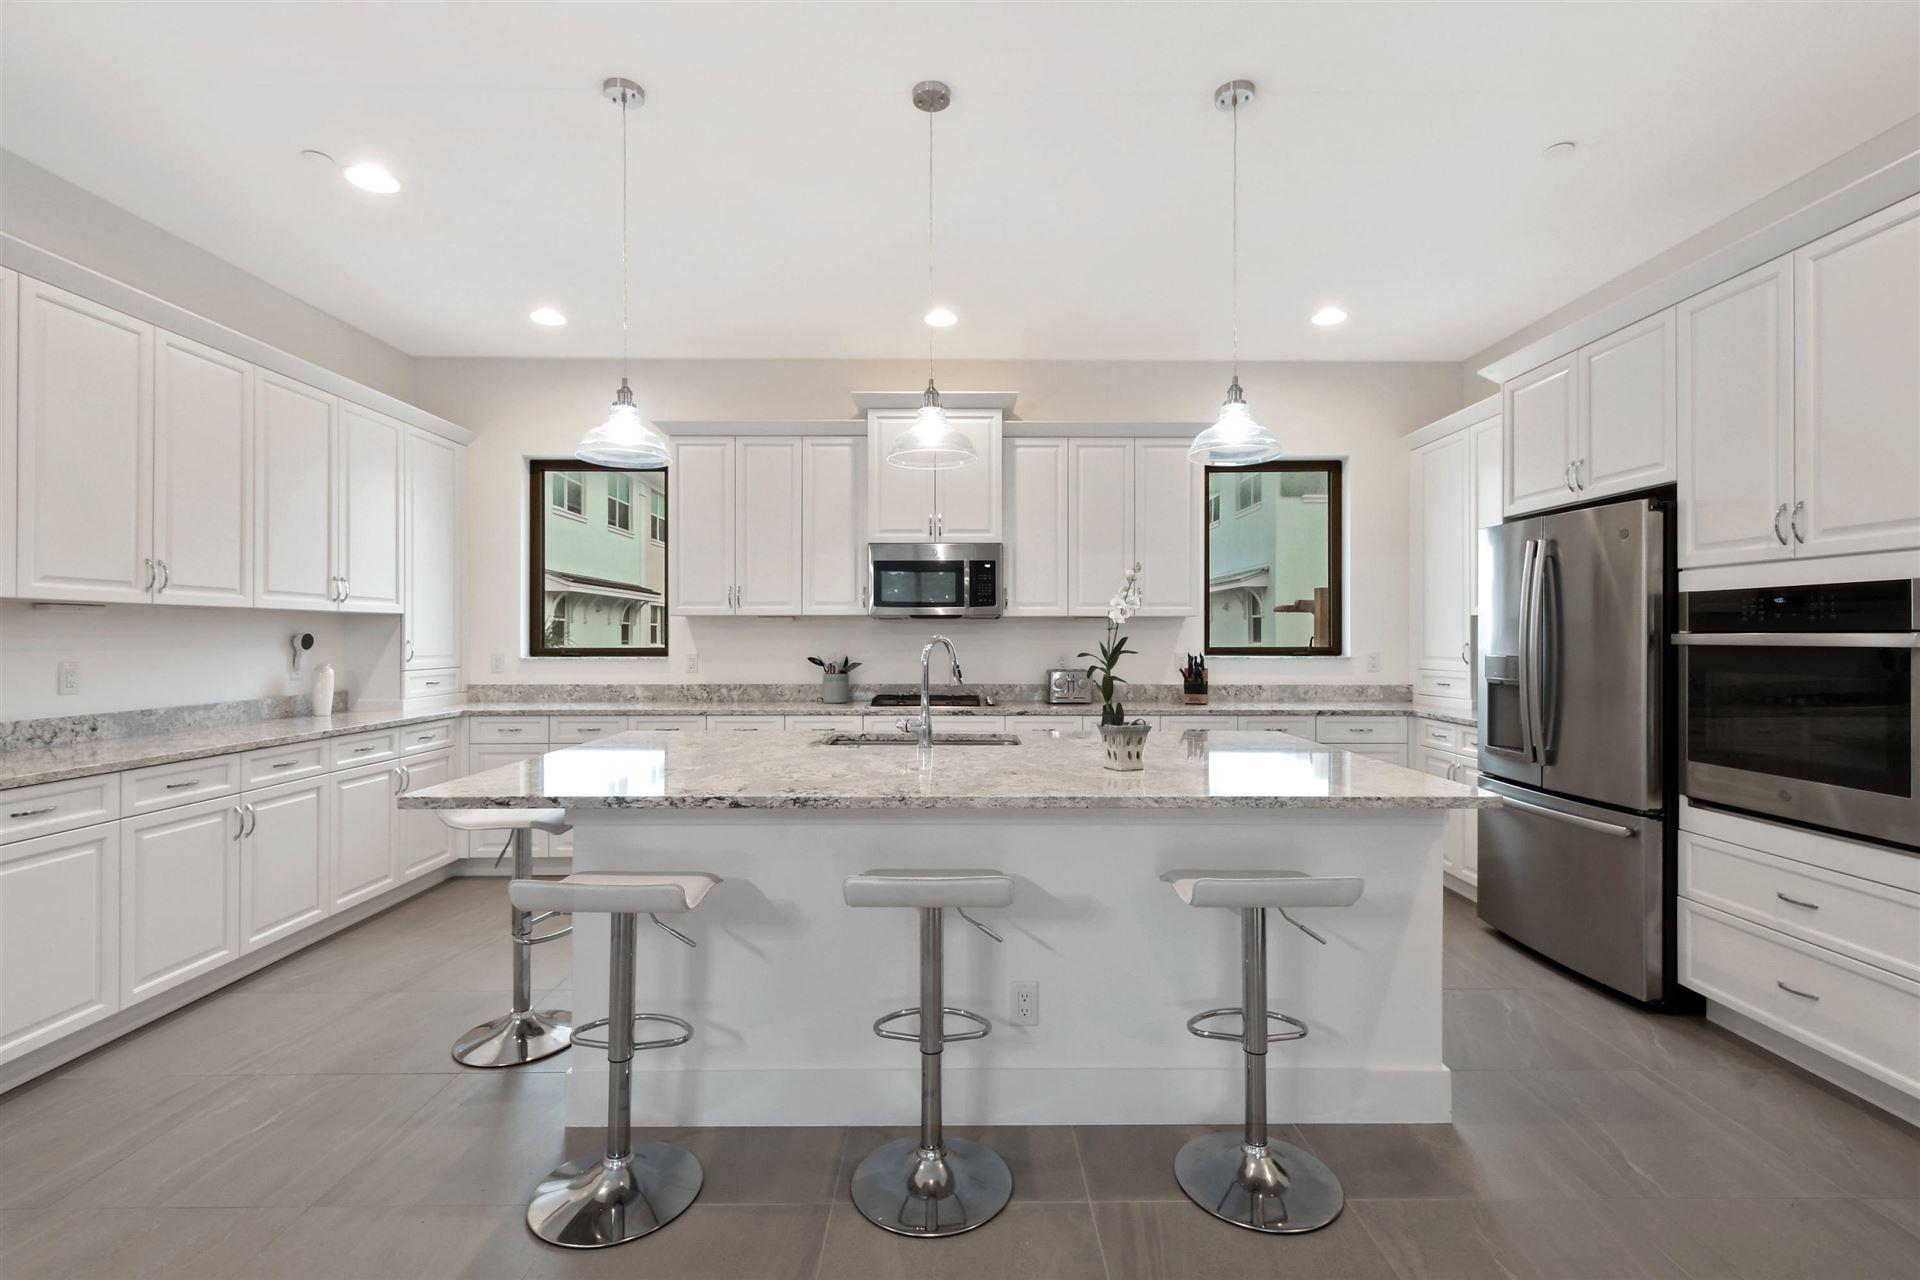 1281 Faulkner Terrace, Palm Beach Gardens, FL 33418 - #: RX-10670724